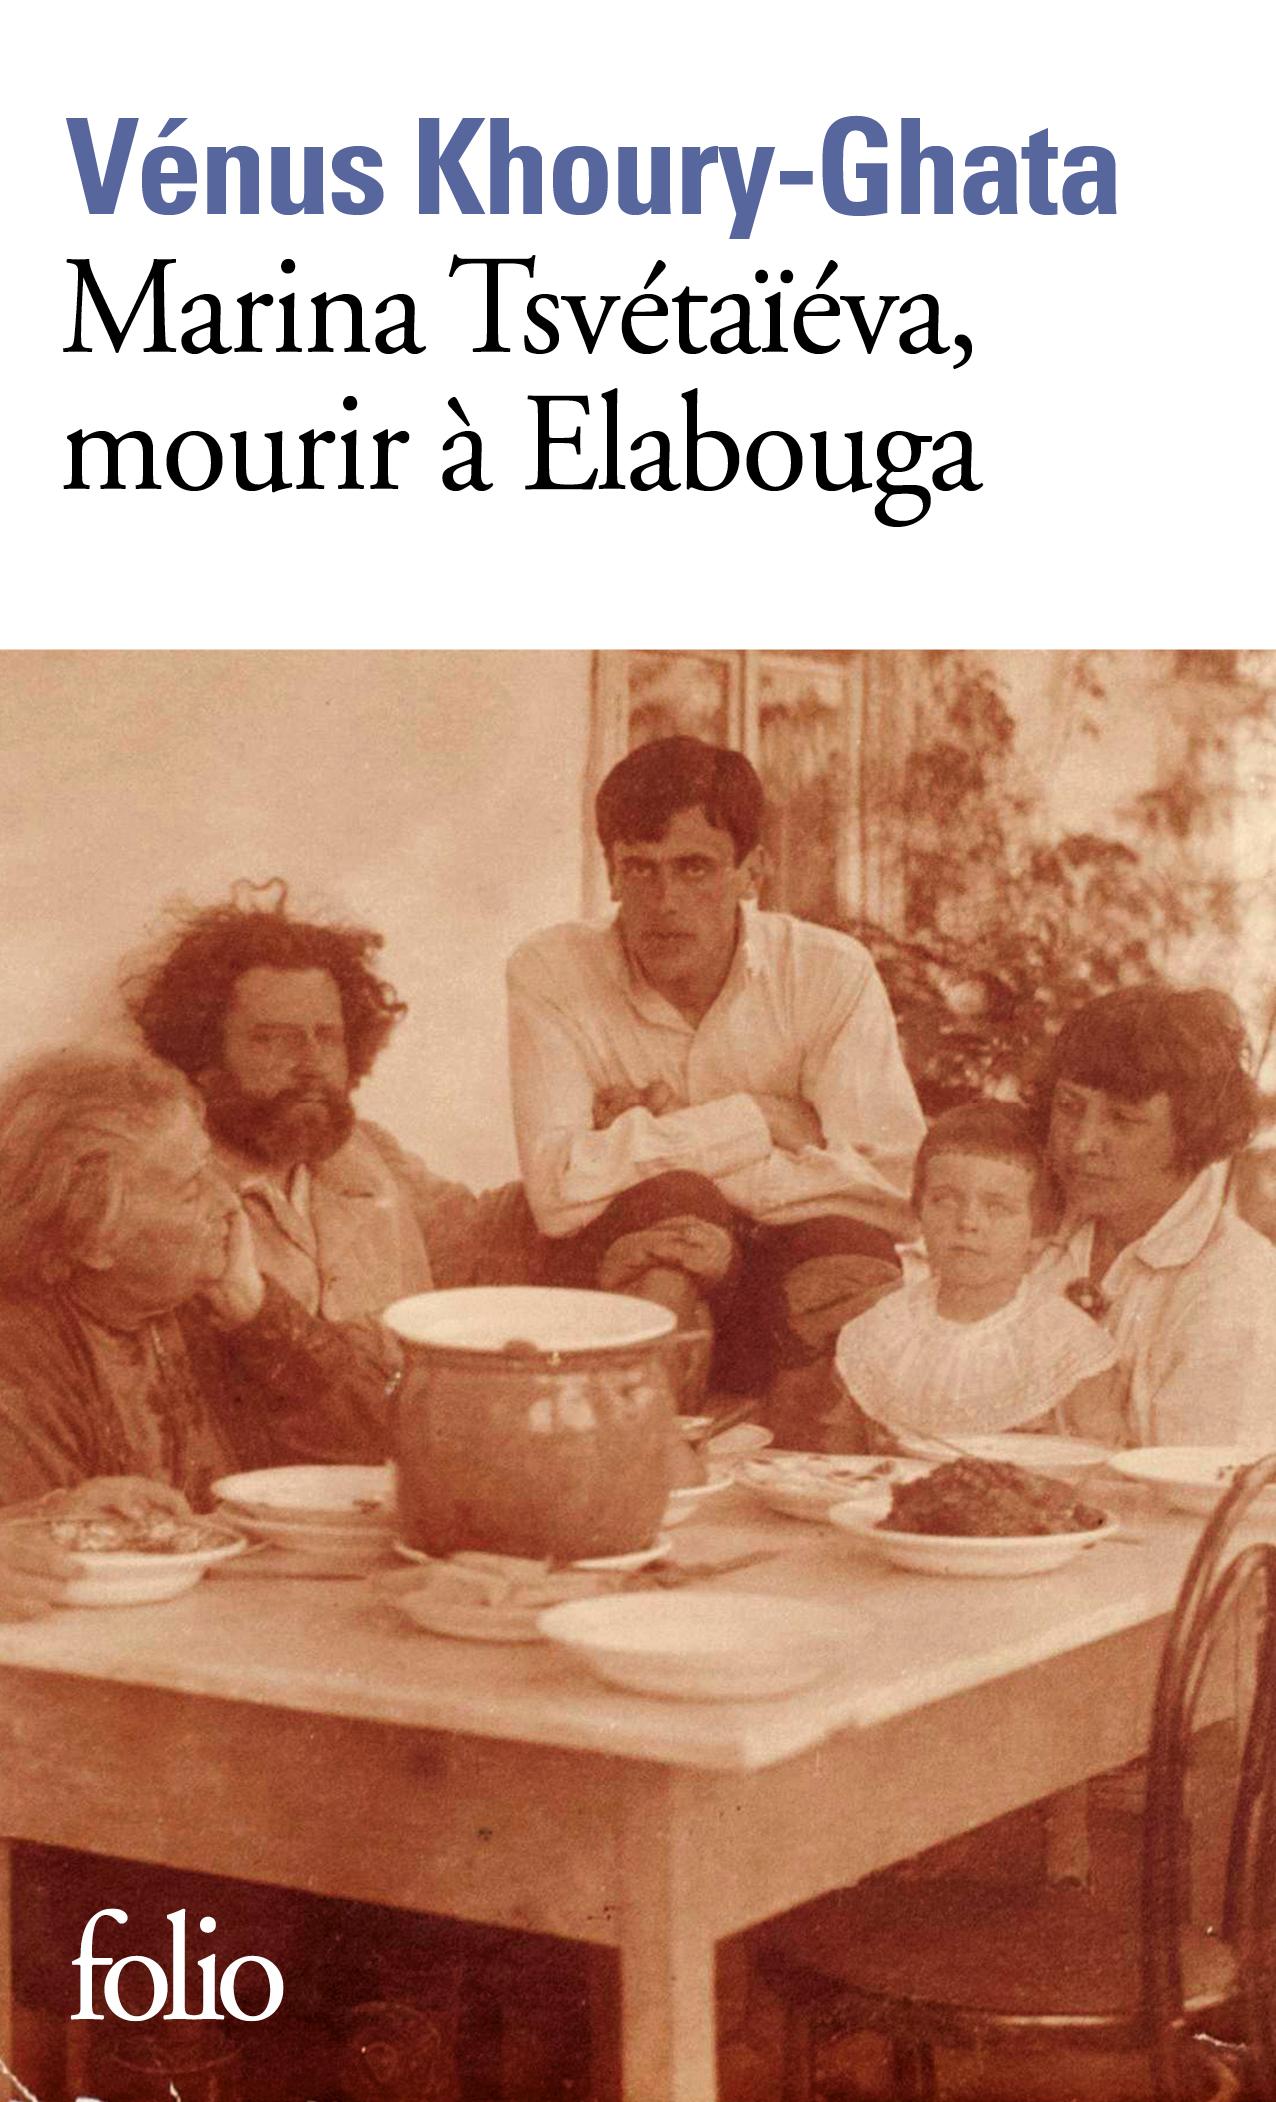 V. Khoury-Ghata, Marina Tsvétaïéva, mourir à Elabouga